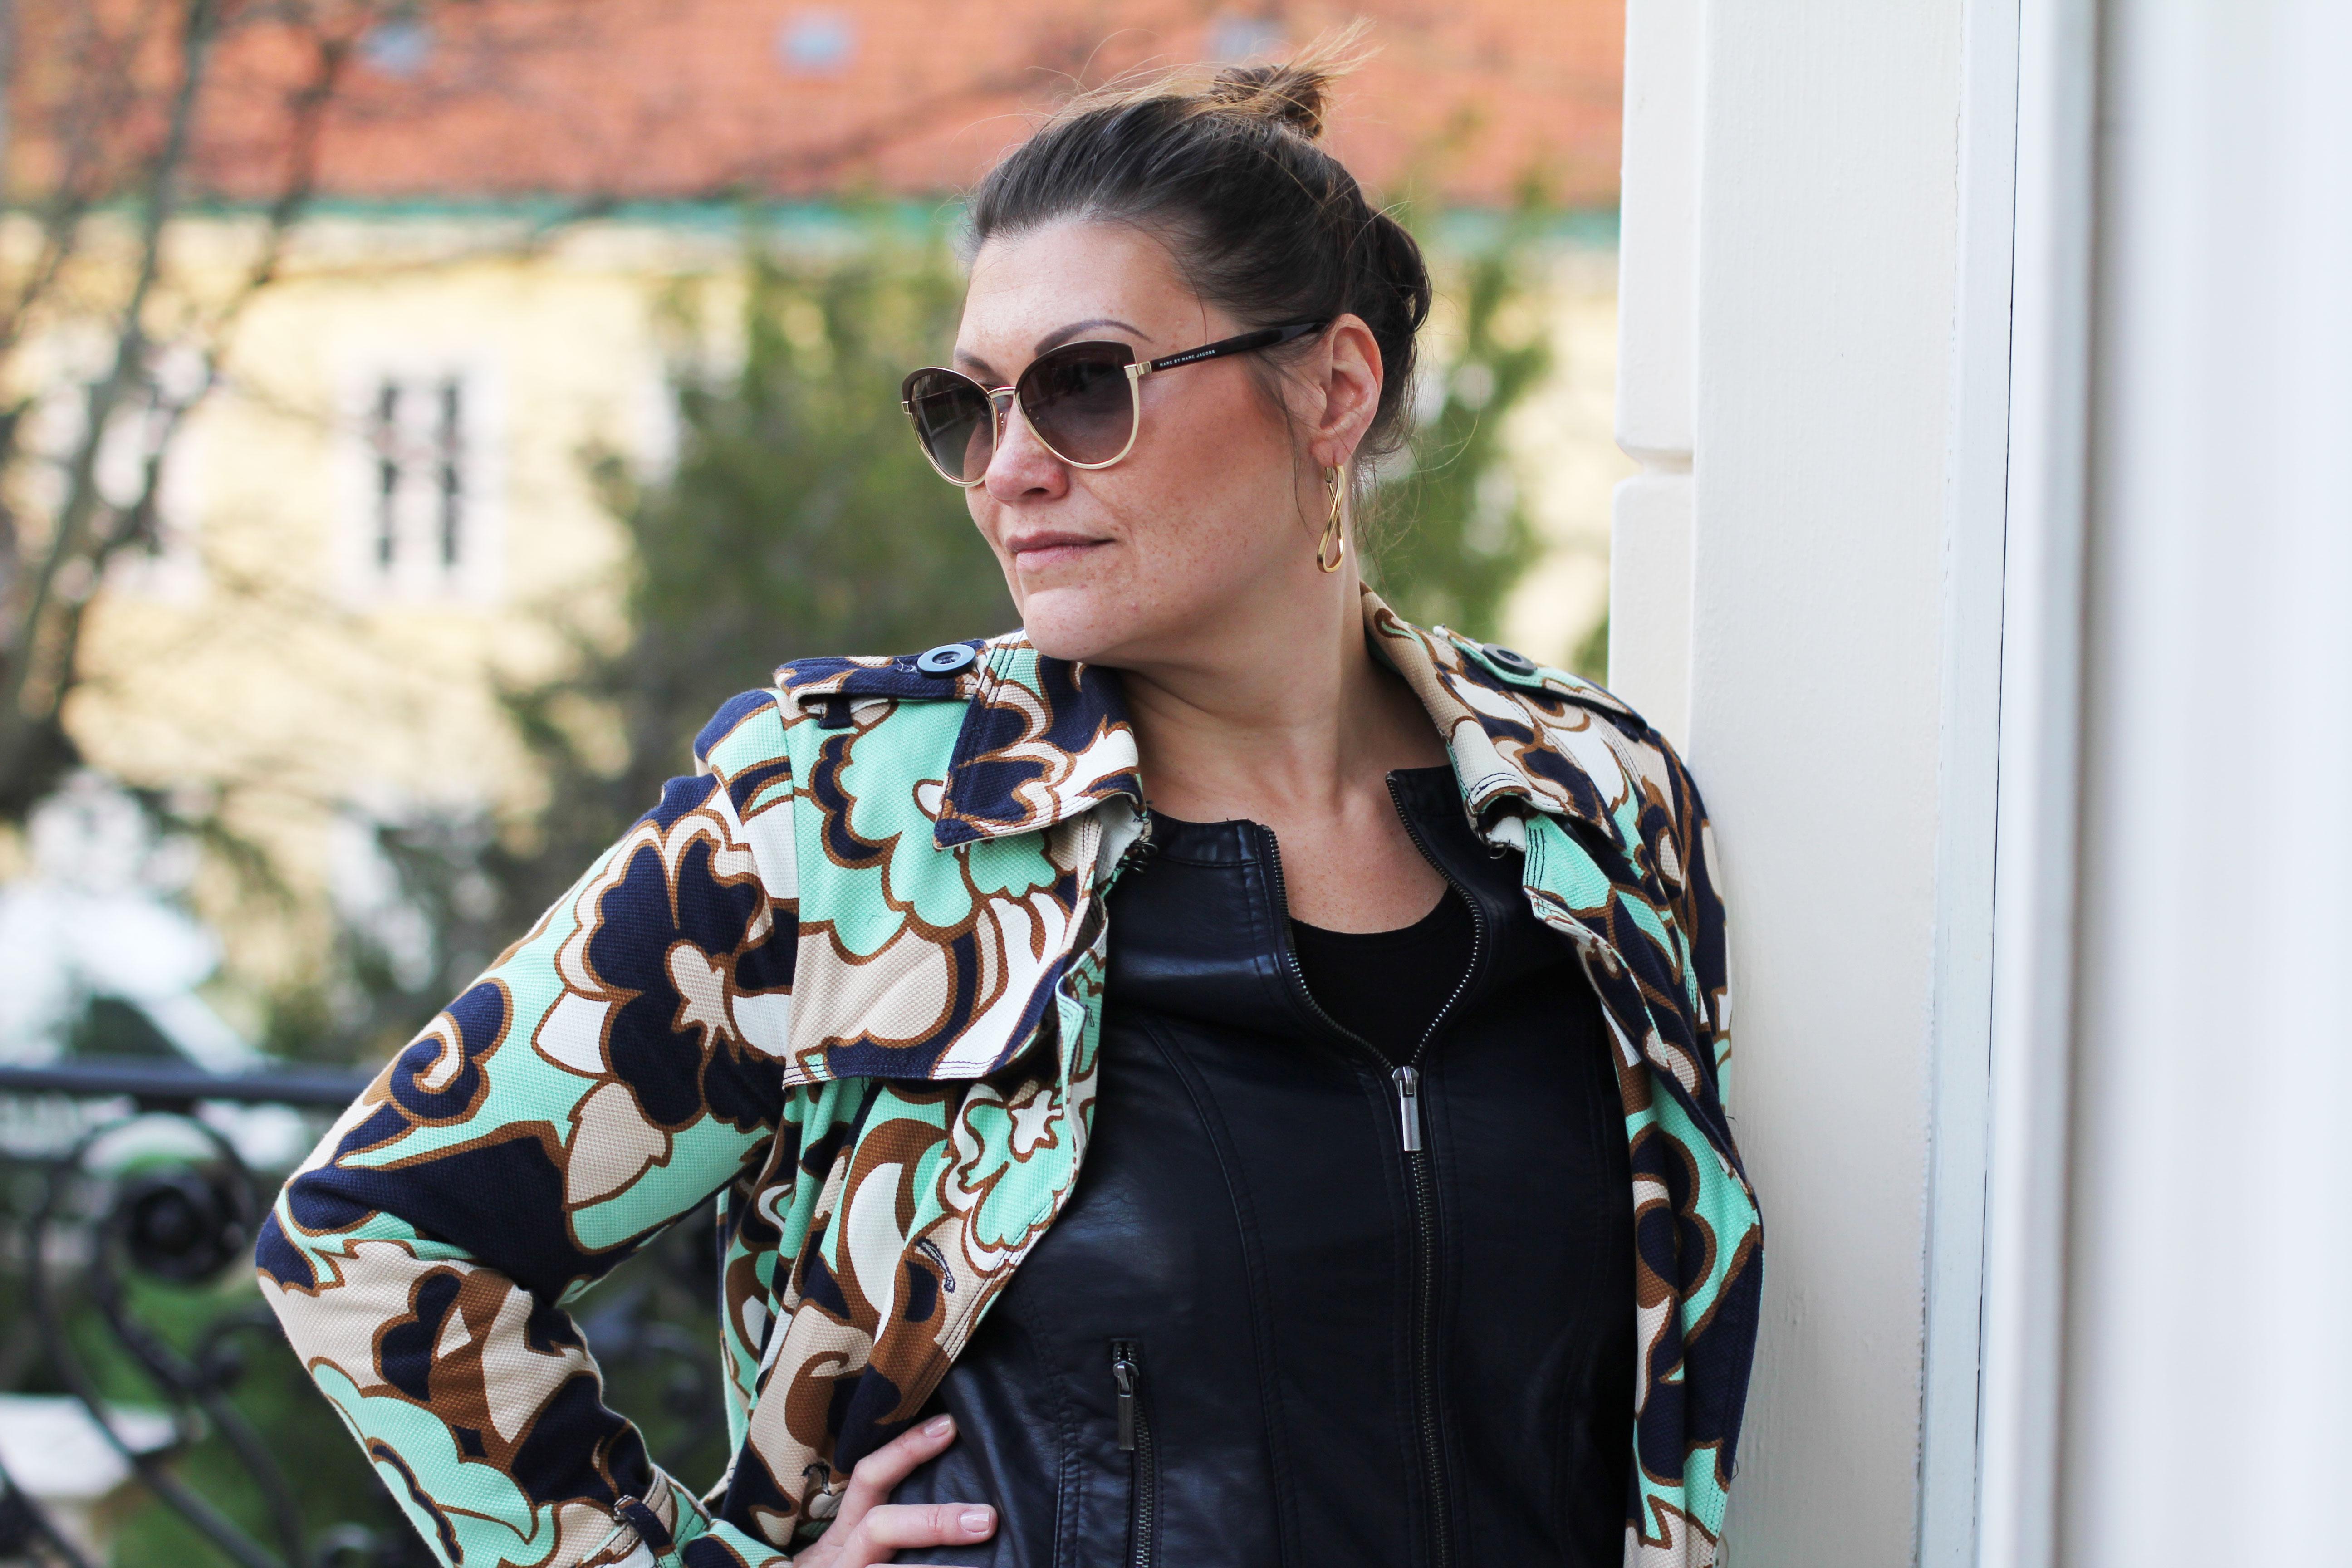 klimt-villa-blumenmuster-mantel-coat-wempe--greenery-kardiaserena-fashion-outfit-plussize-austrianblogger-plussizeblogger-tom-ford-sonnenbrille